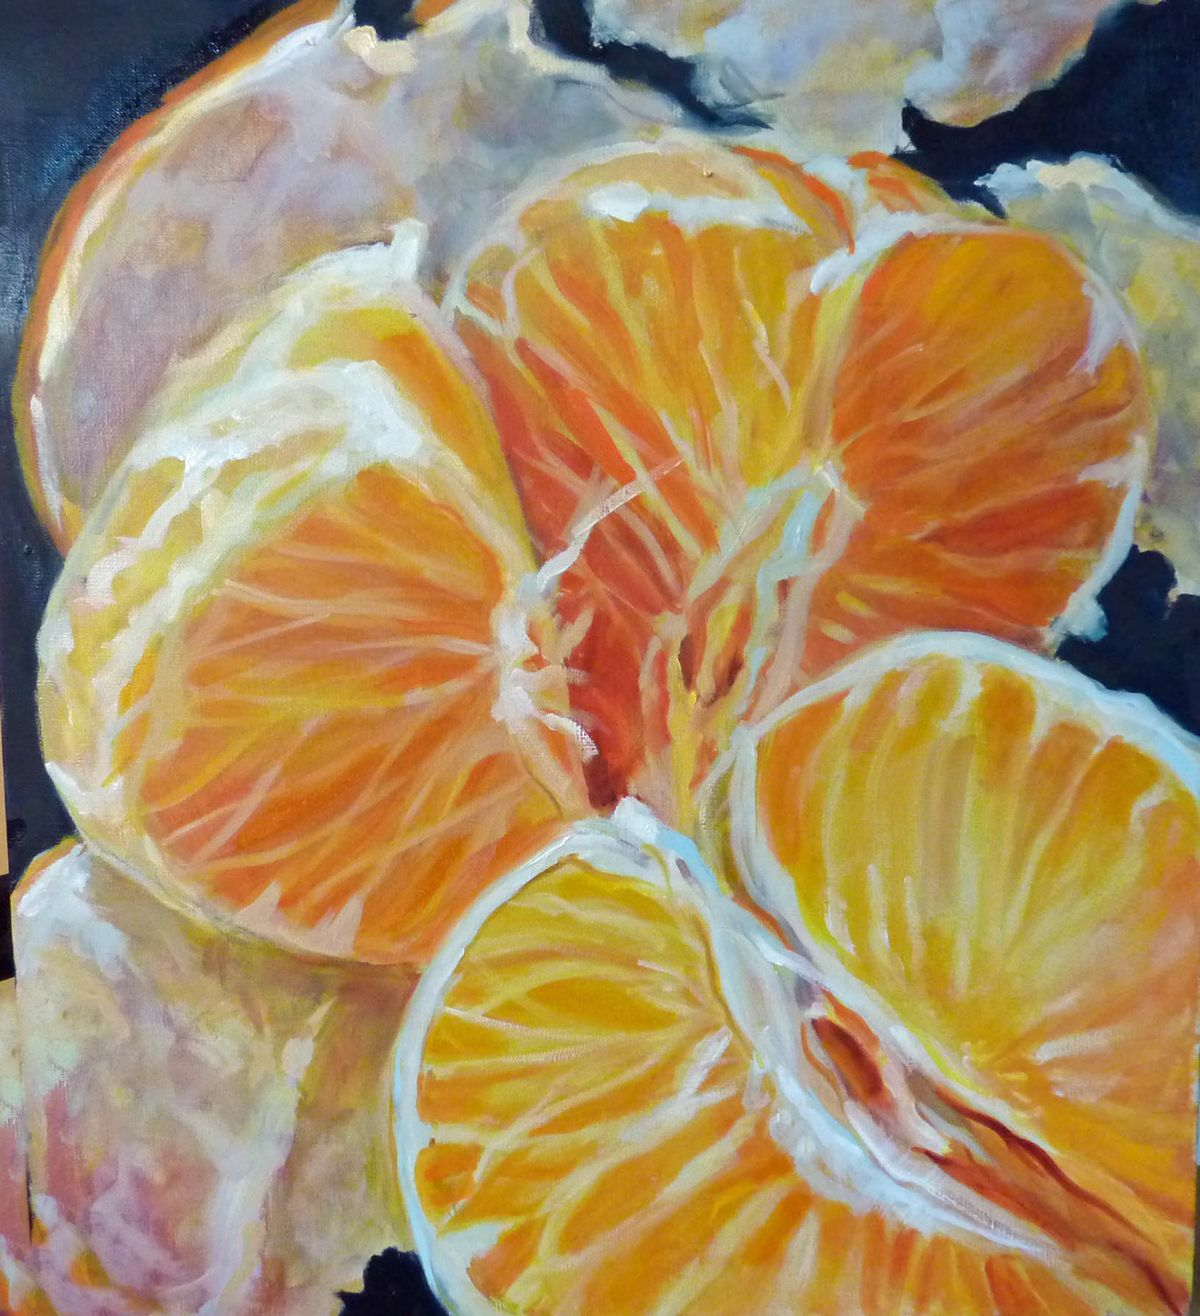 Pin De Lucrecia Rodriguez Zarza En Pintura Pinturas Pintura Al Oleo Dibujos